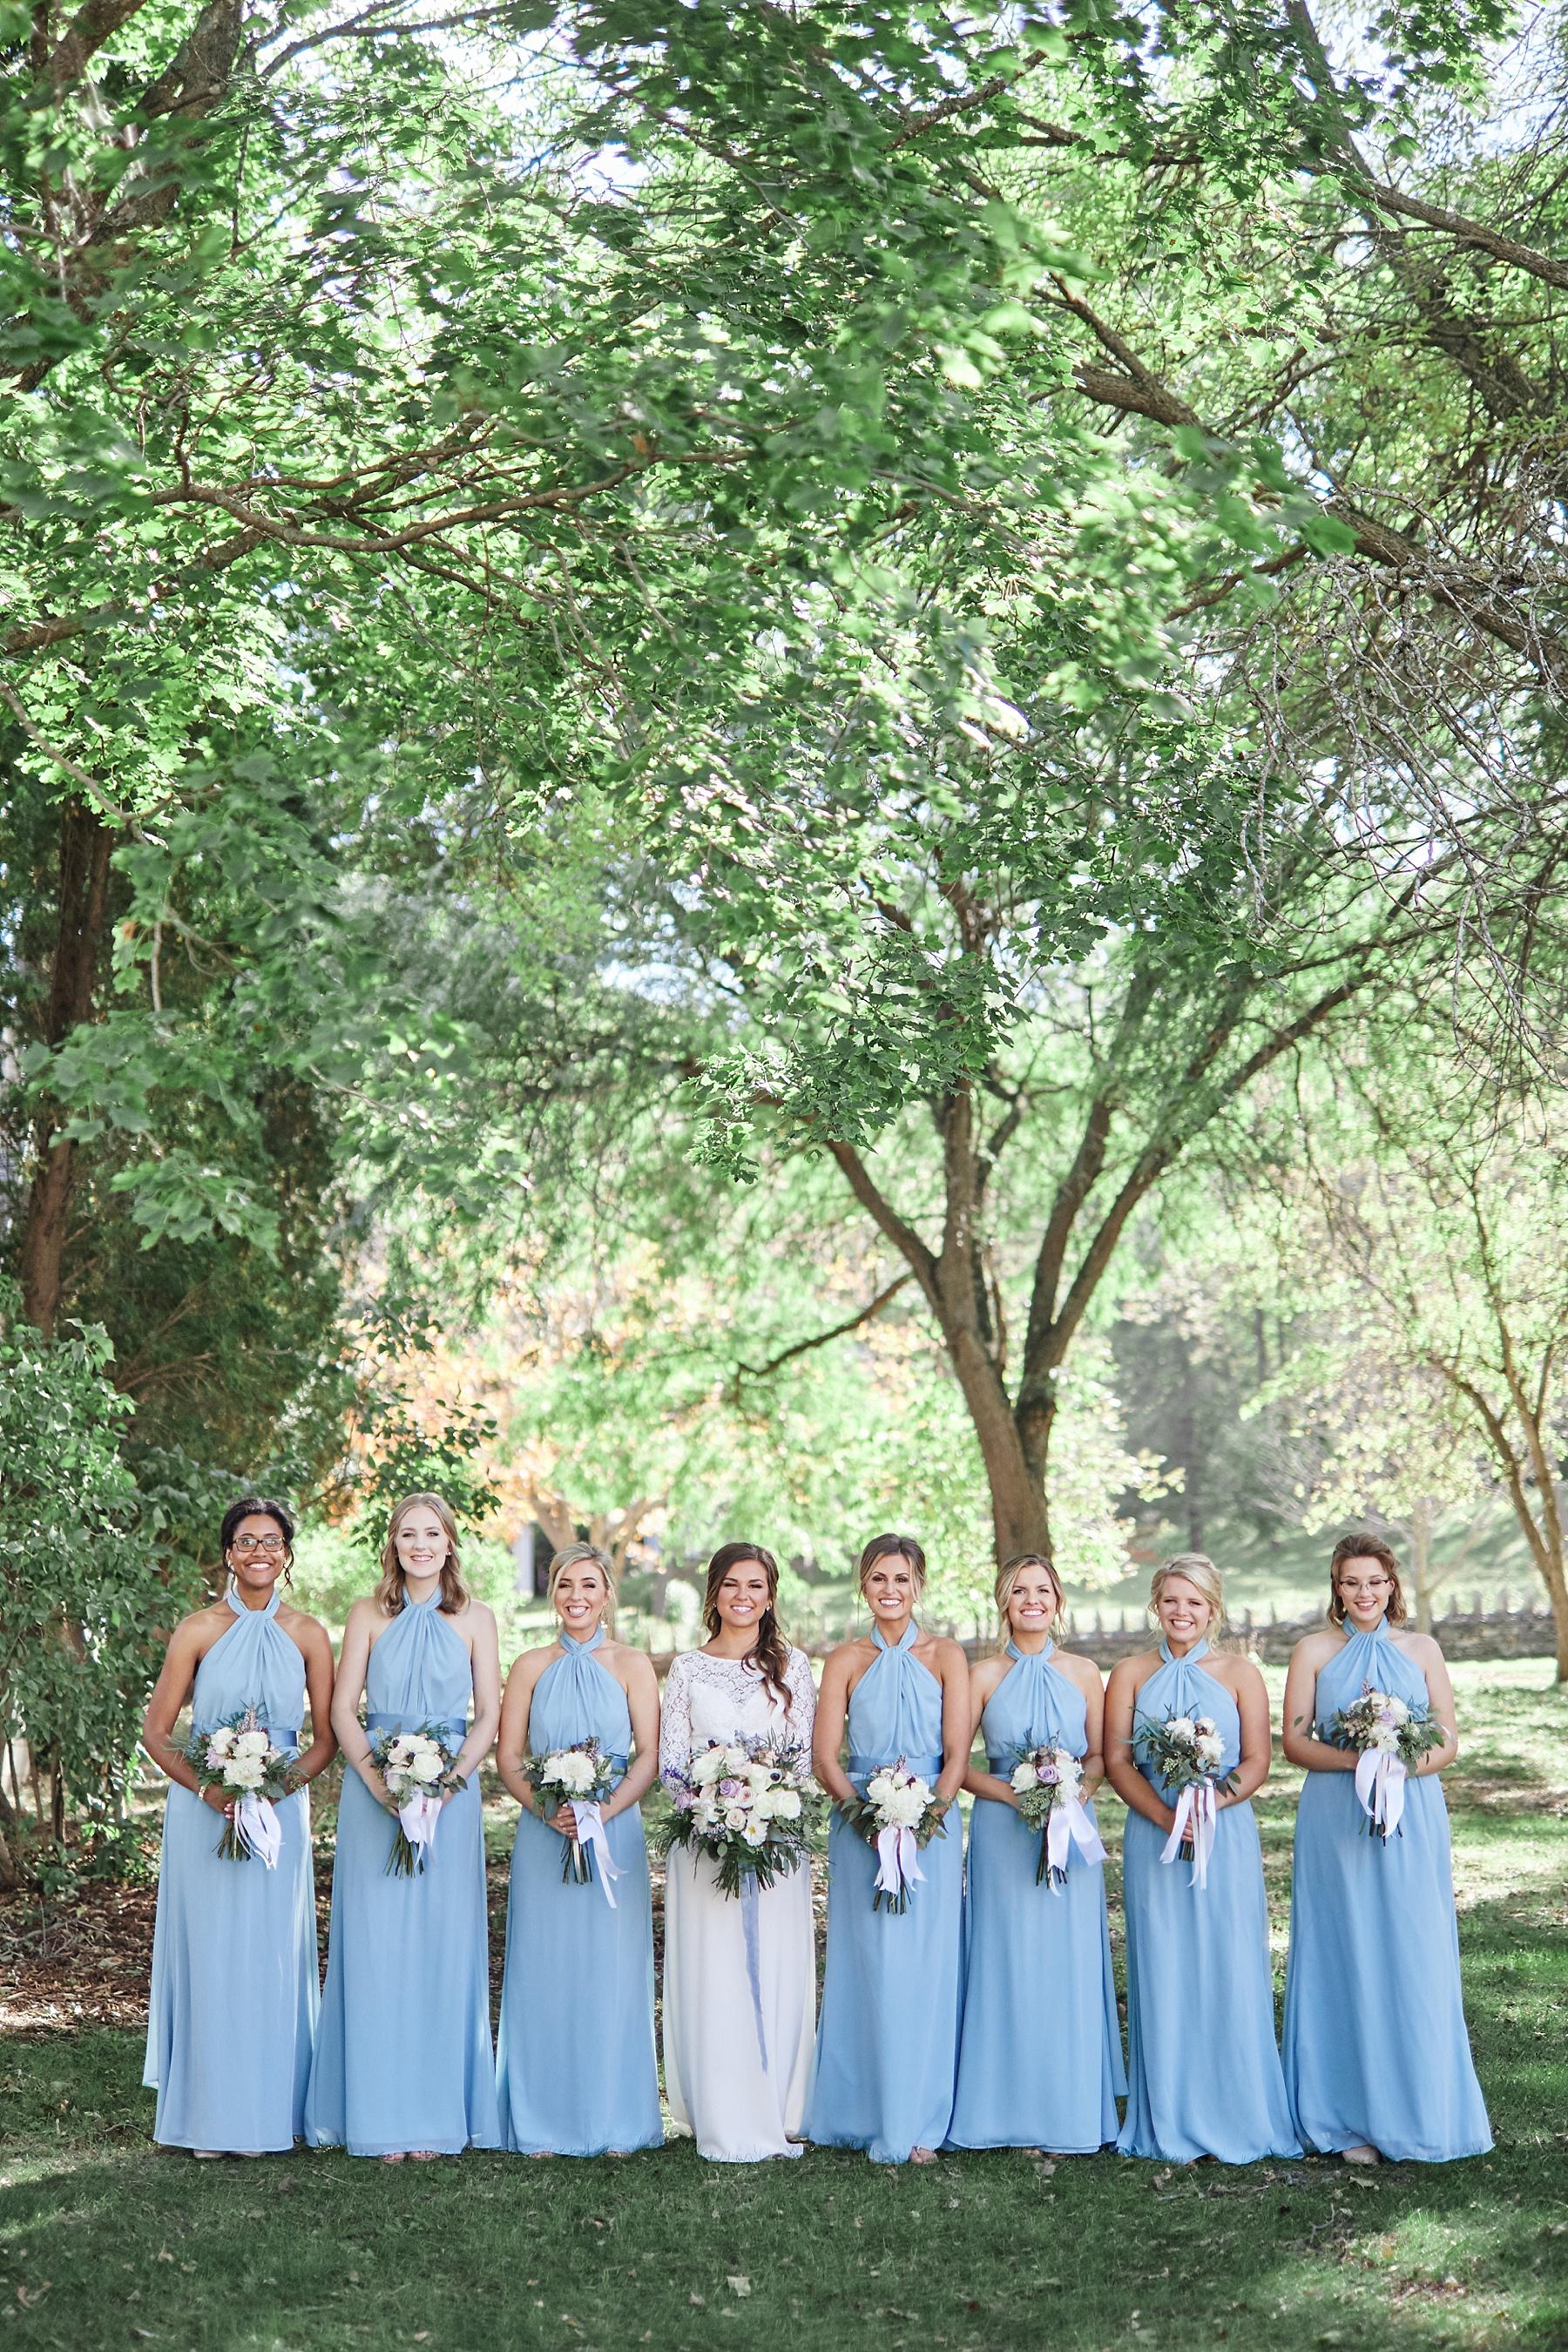 Maywood-Stone-Barn-Wedding-Rochester-Minnesota-Perry-James-Photo_0611.jpg